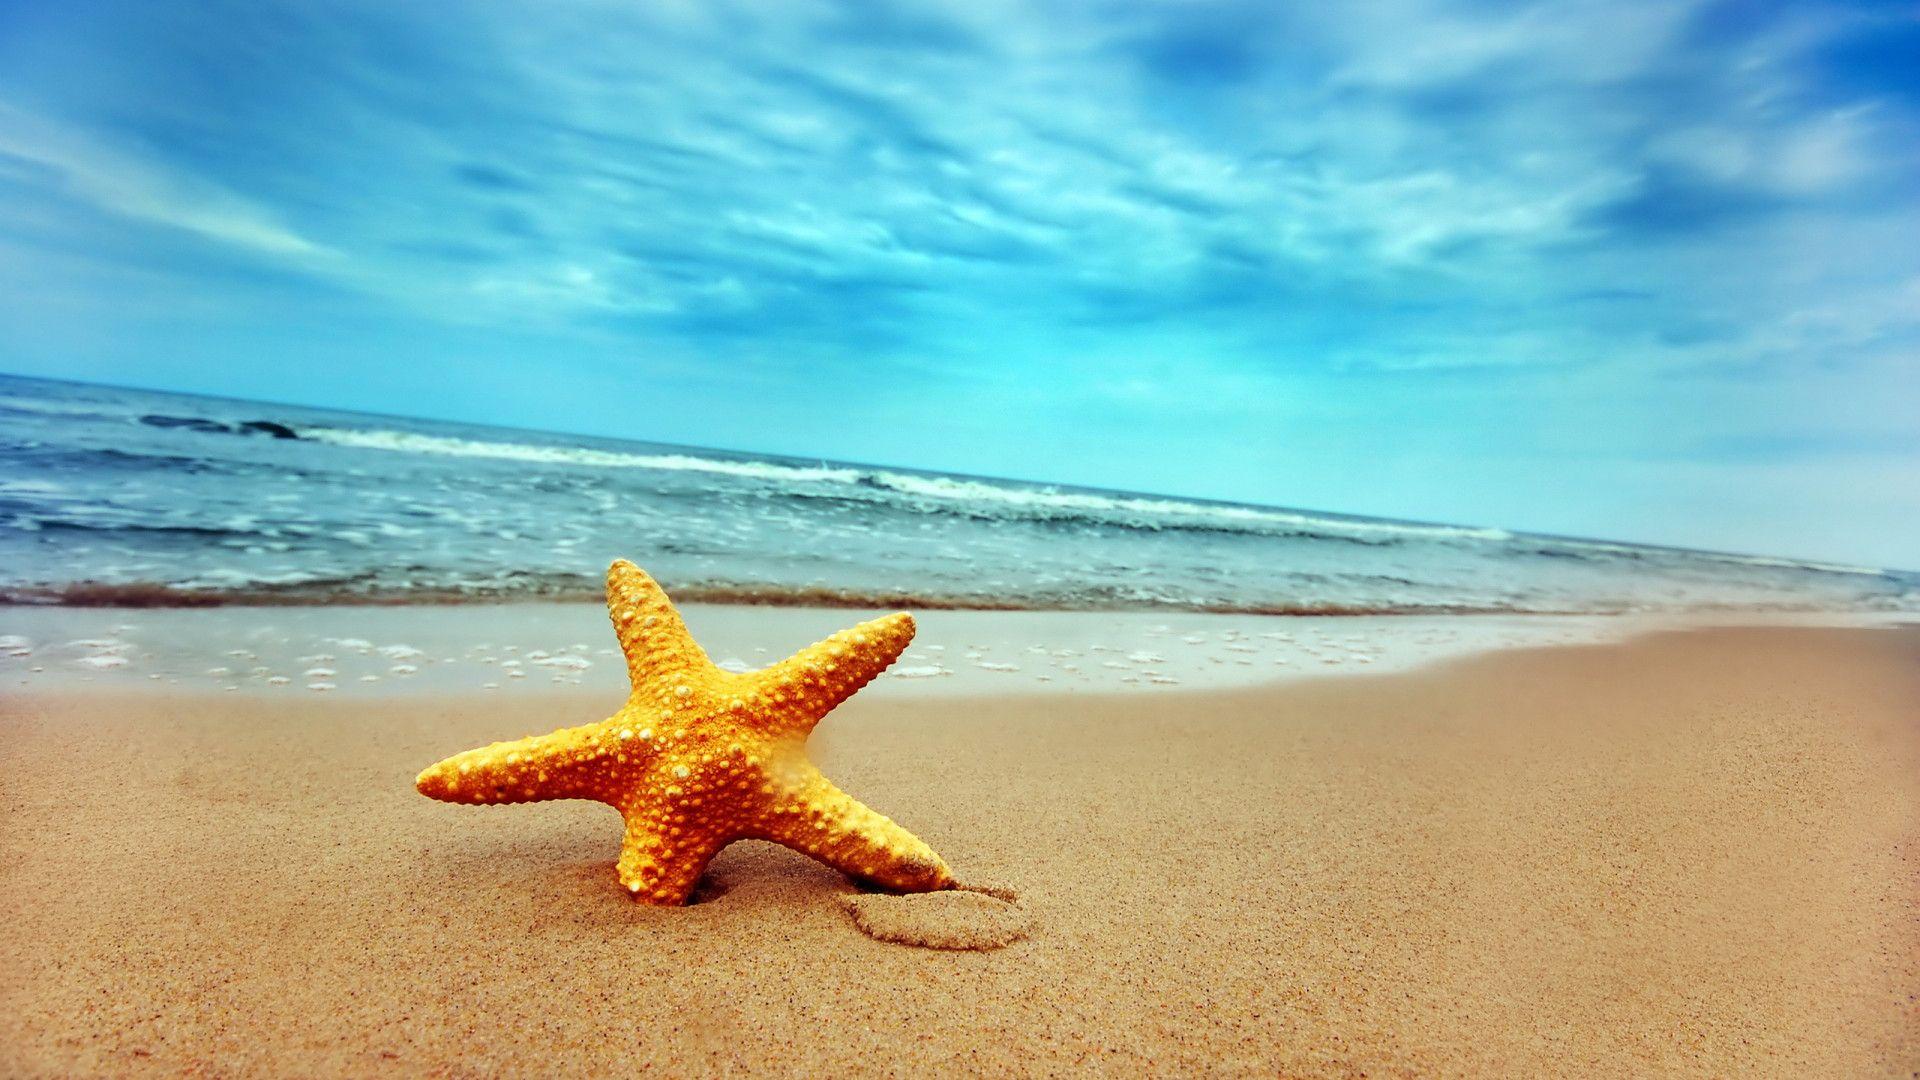 Beach And Star Fish Wallpaper Free Wallpapers For Desktop Hd Beach Wallpaper Summer Time Summer Photography